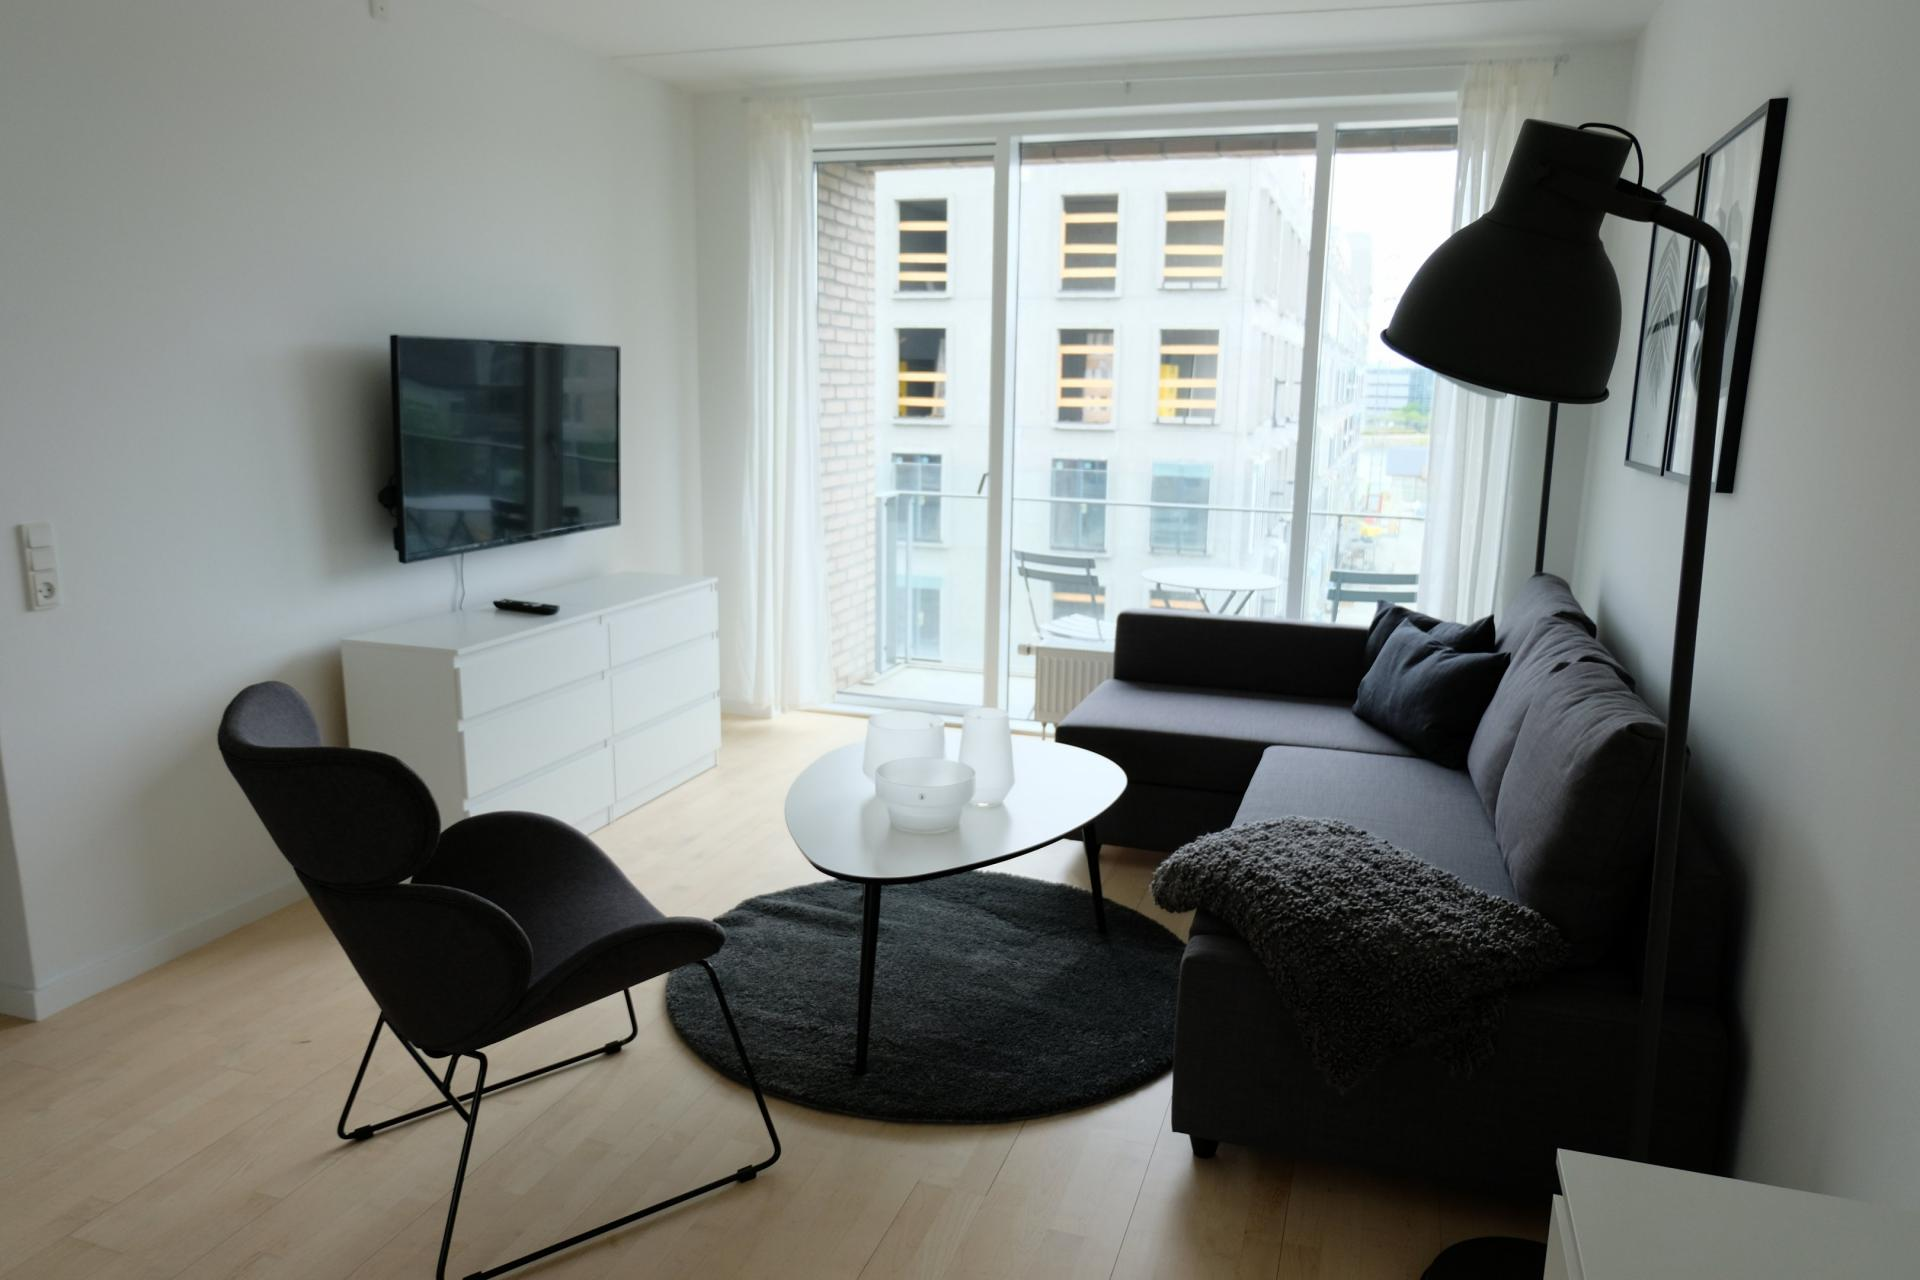 Living area at Sluseholmen Apartment, Sydhavnen, Copenhagen